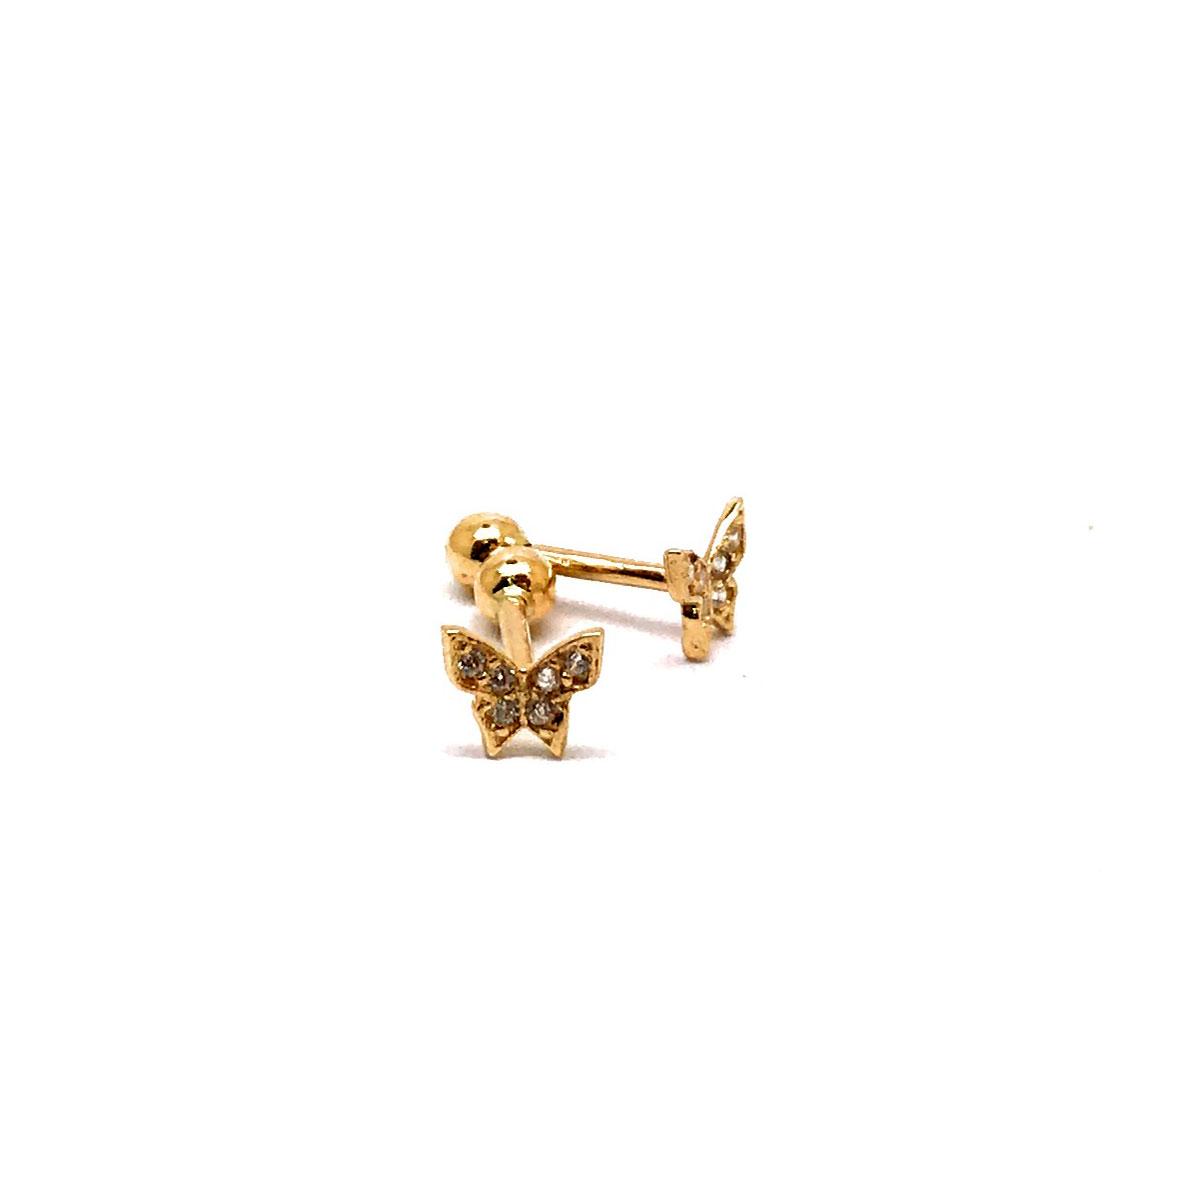 Piercing Borboleta Com Pedras De Zircônia Brilhantes 25719 k035